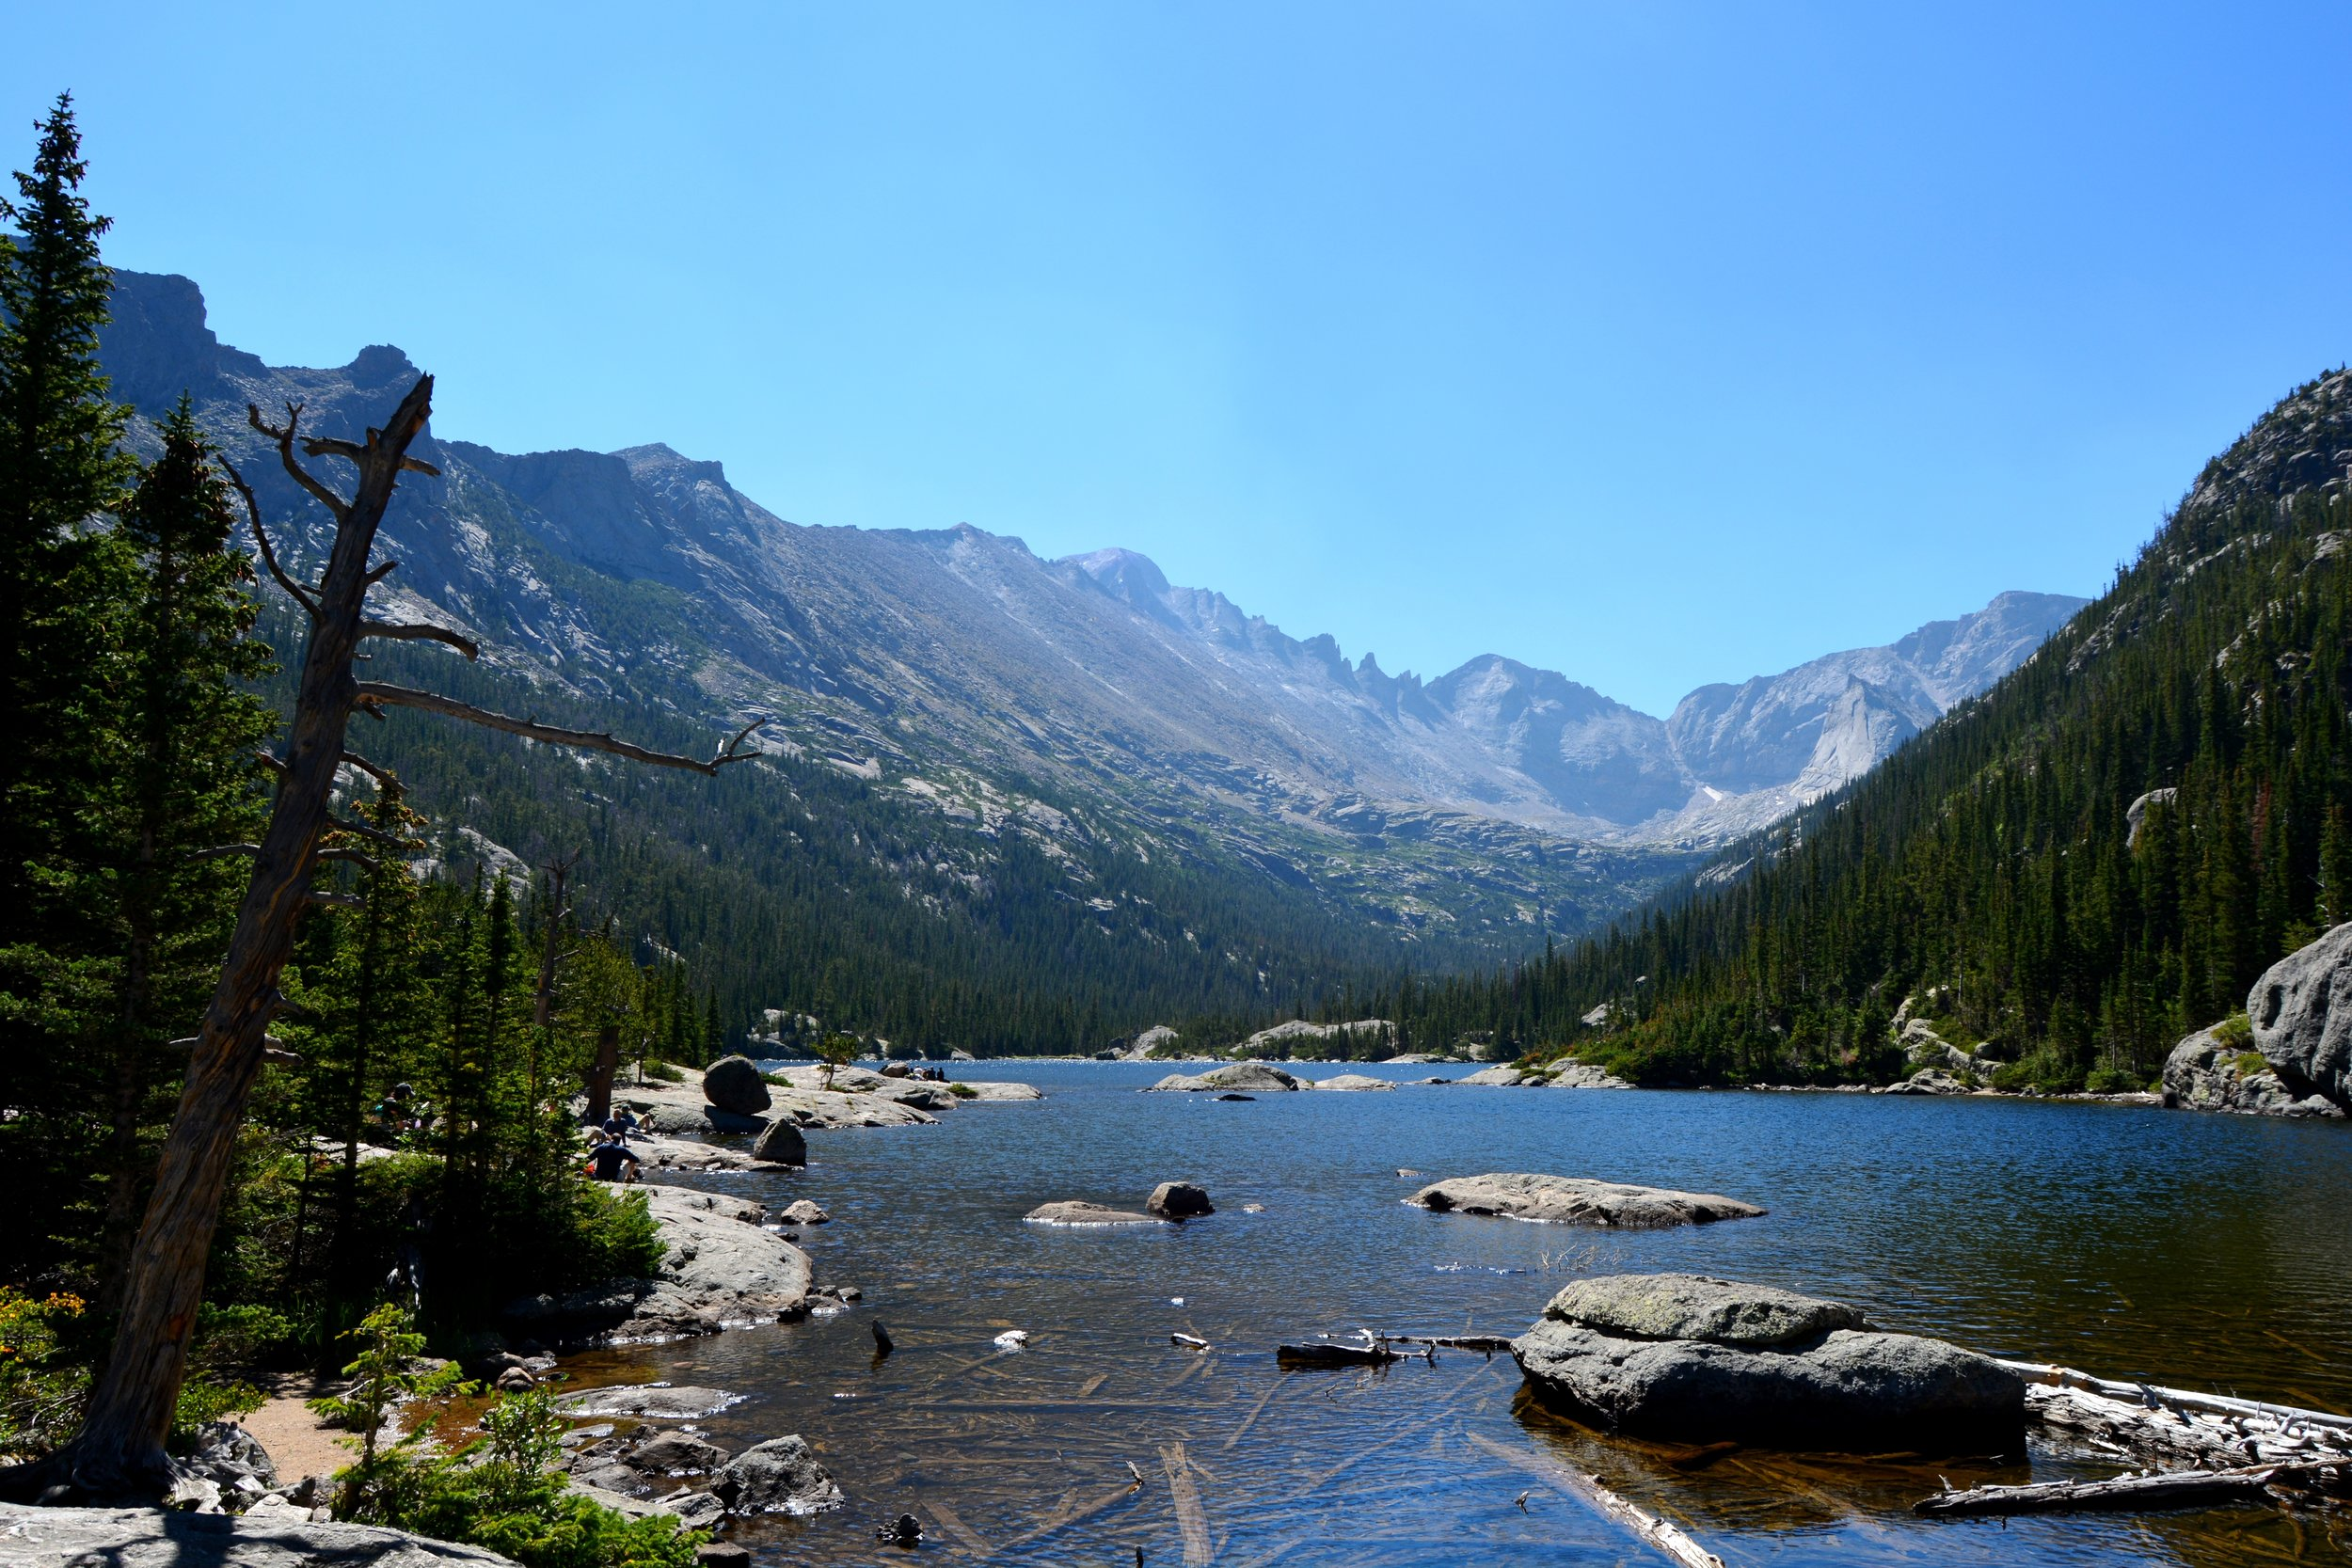 Mills Lake - so calm and beautiful!